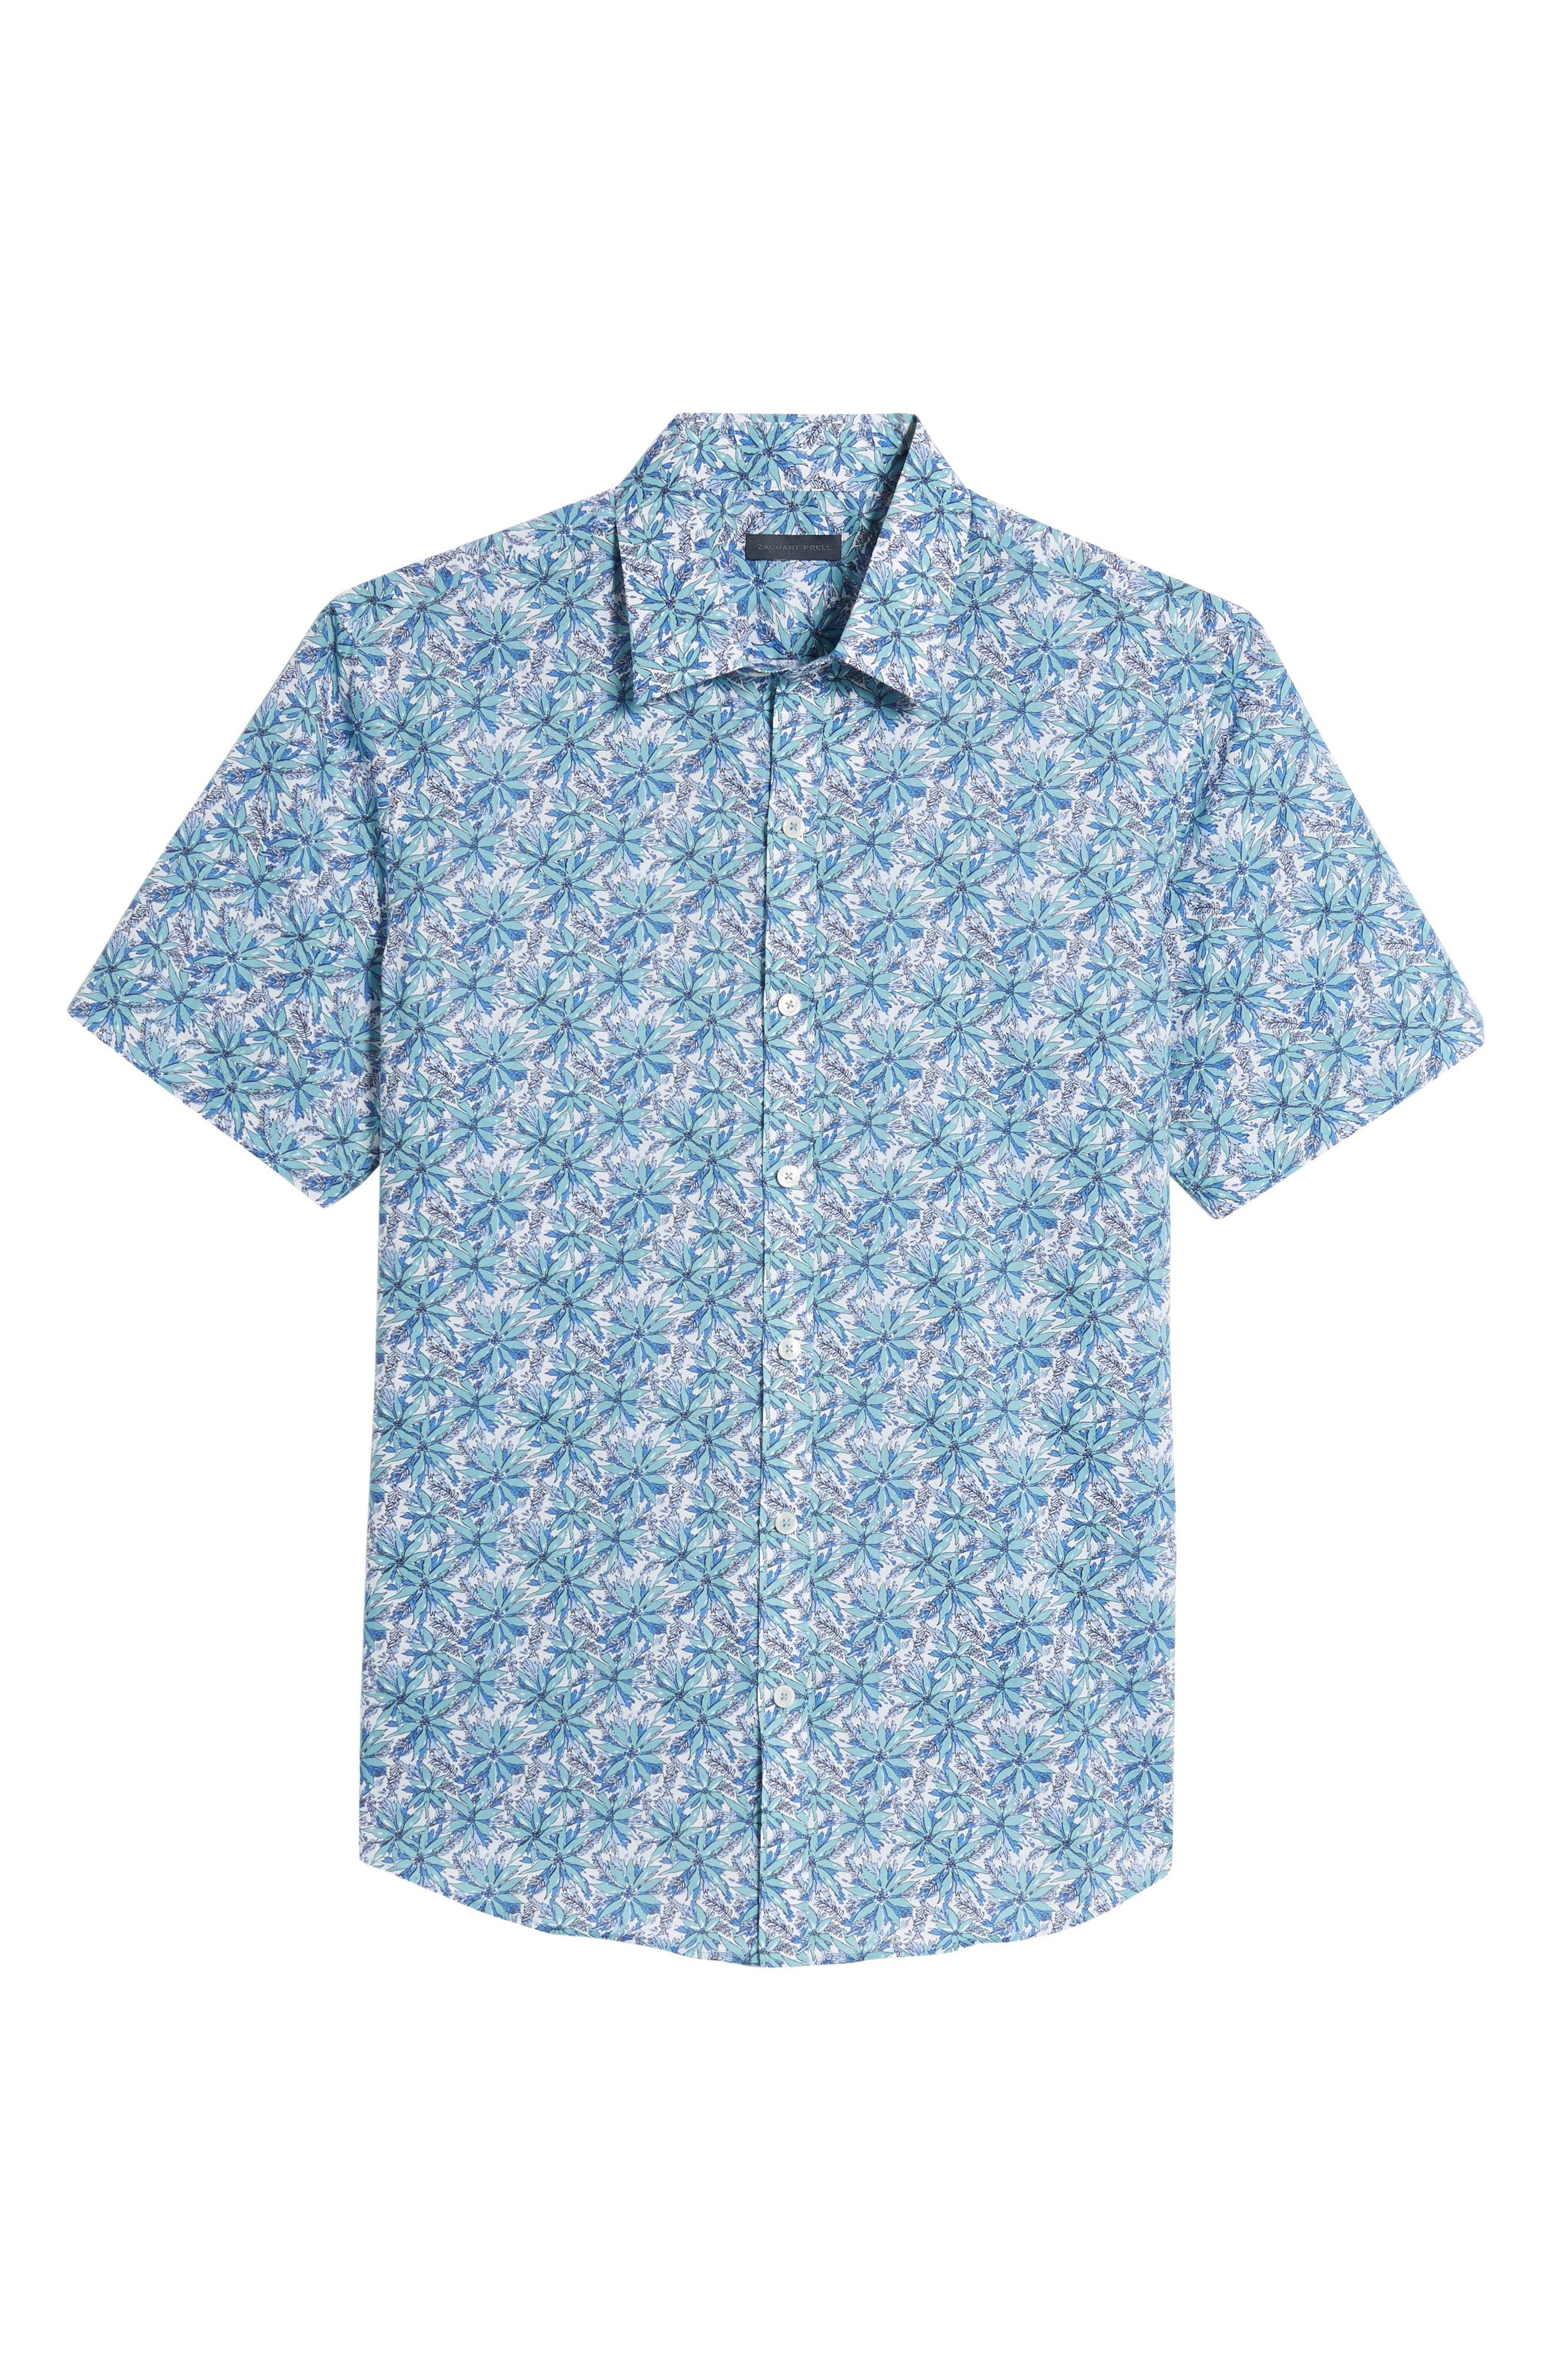 Goelzer Trim Fit Sport Shirt,                             Alternate thumbnail 6, color,                             Aqua